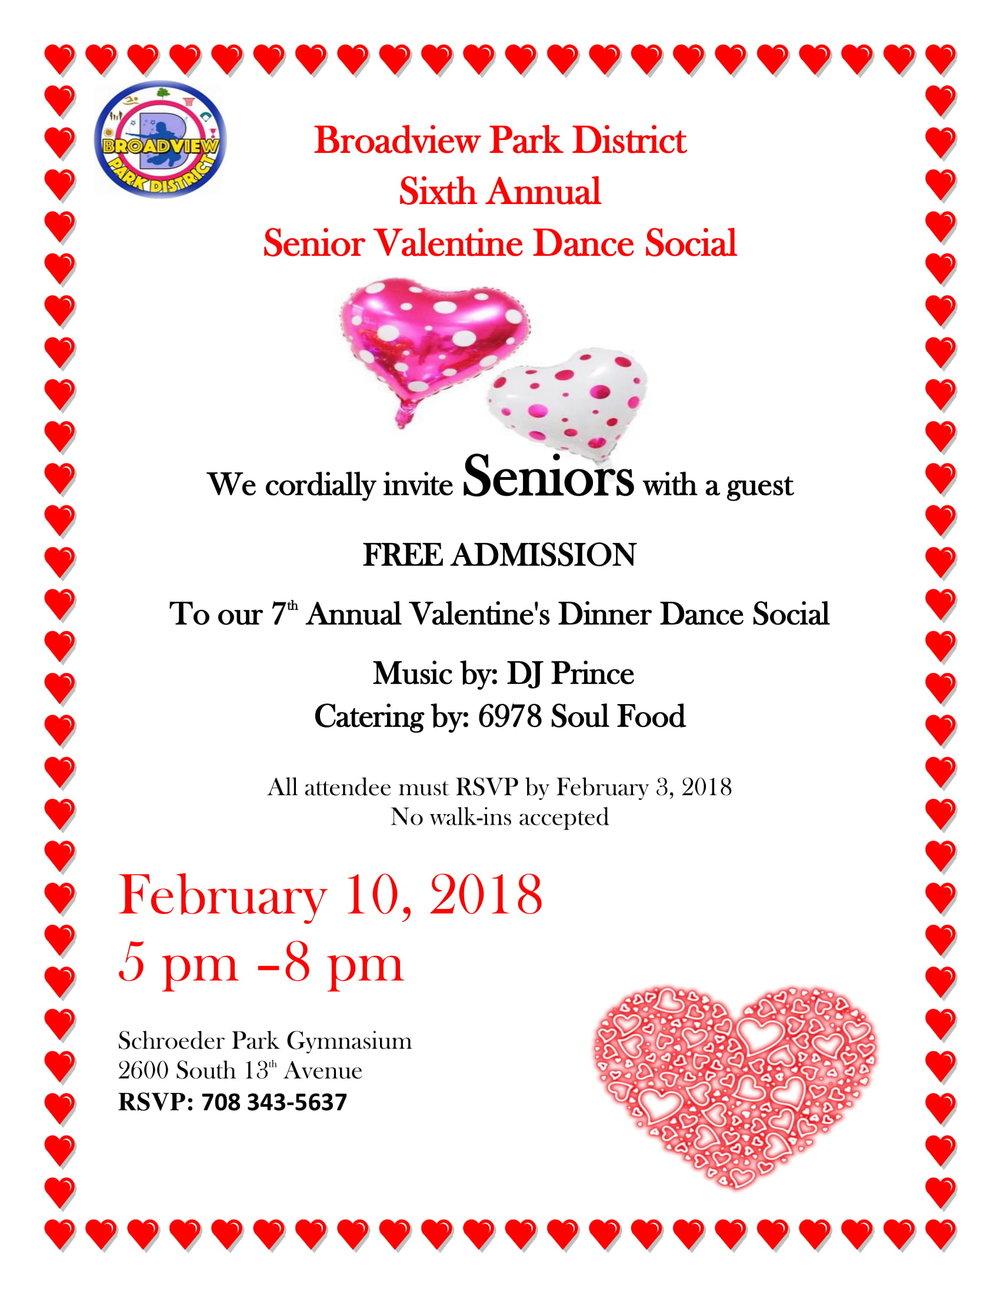 ab 2018 Senior Valentine Dance Social Flyer (Ada  Benjamin)-1.jpg